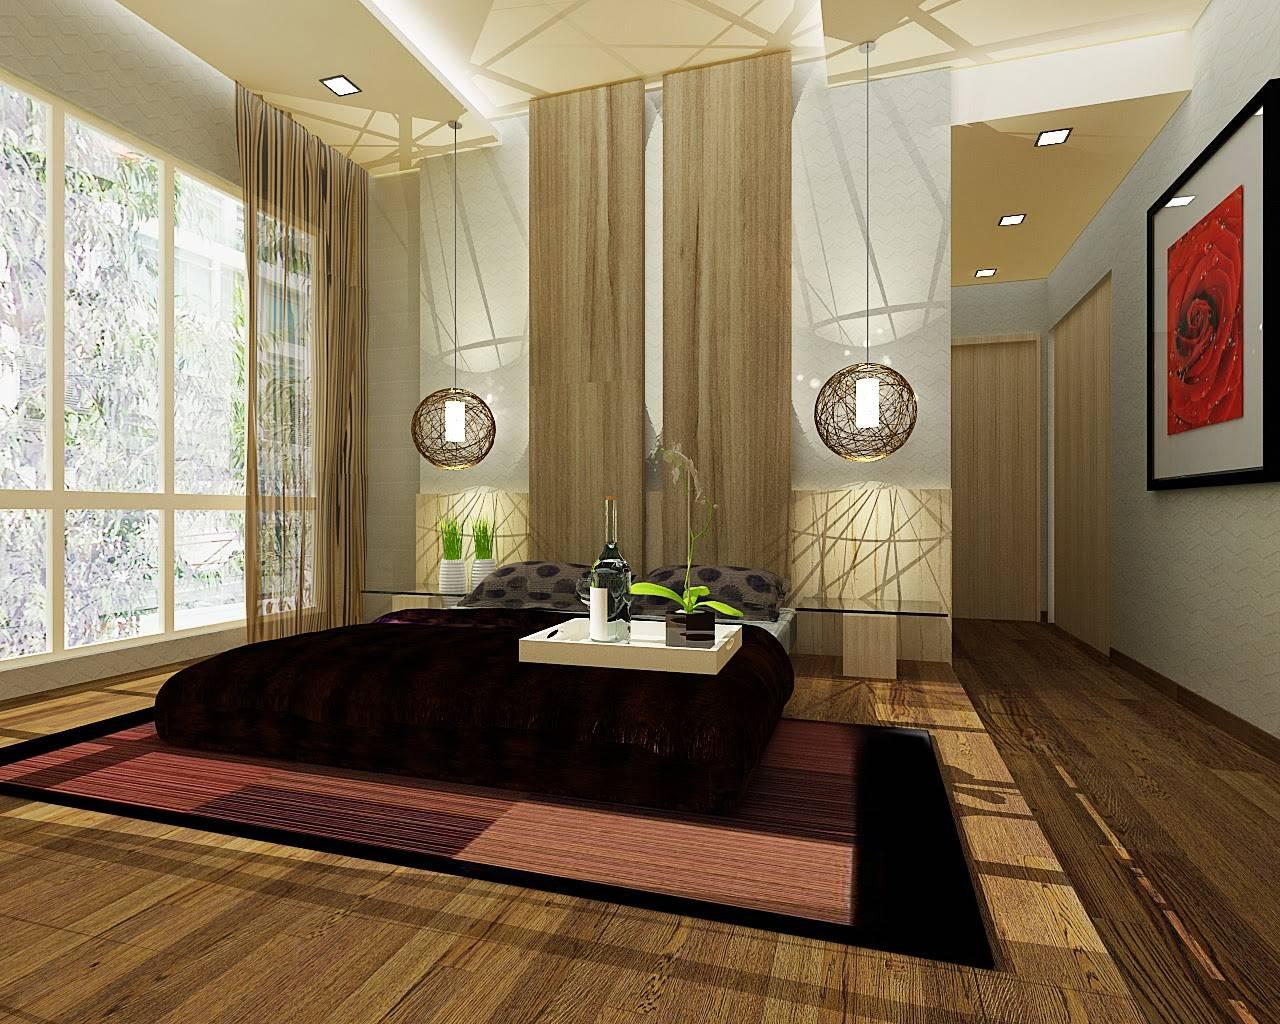 Bedroom Glamor Ideas Zen Style. Bedroom American Style Bedrooms Design   House Plans    14883